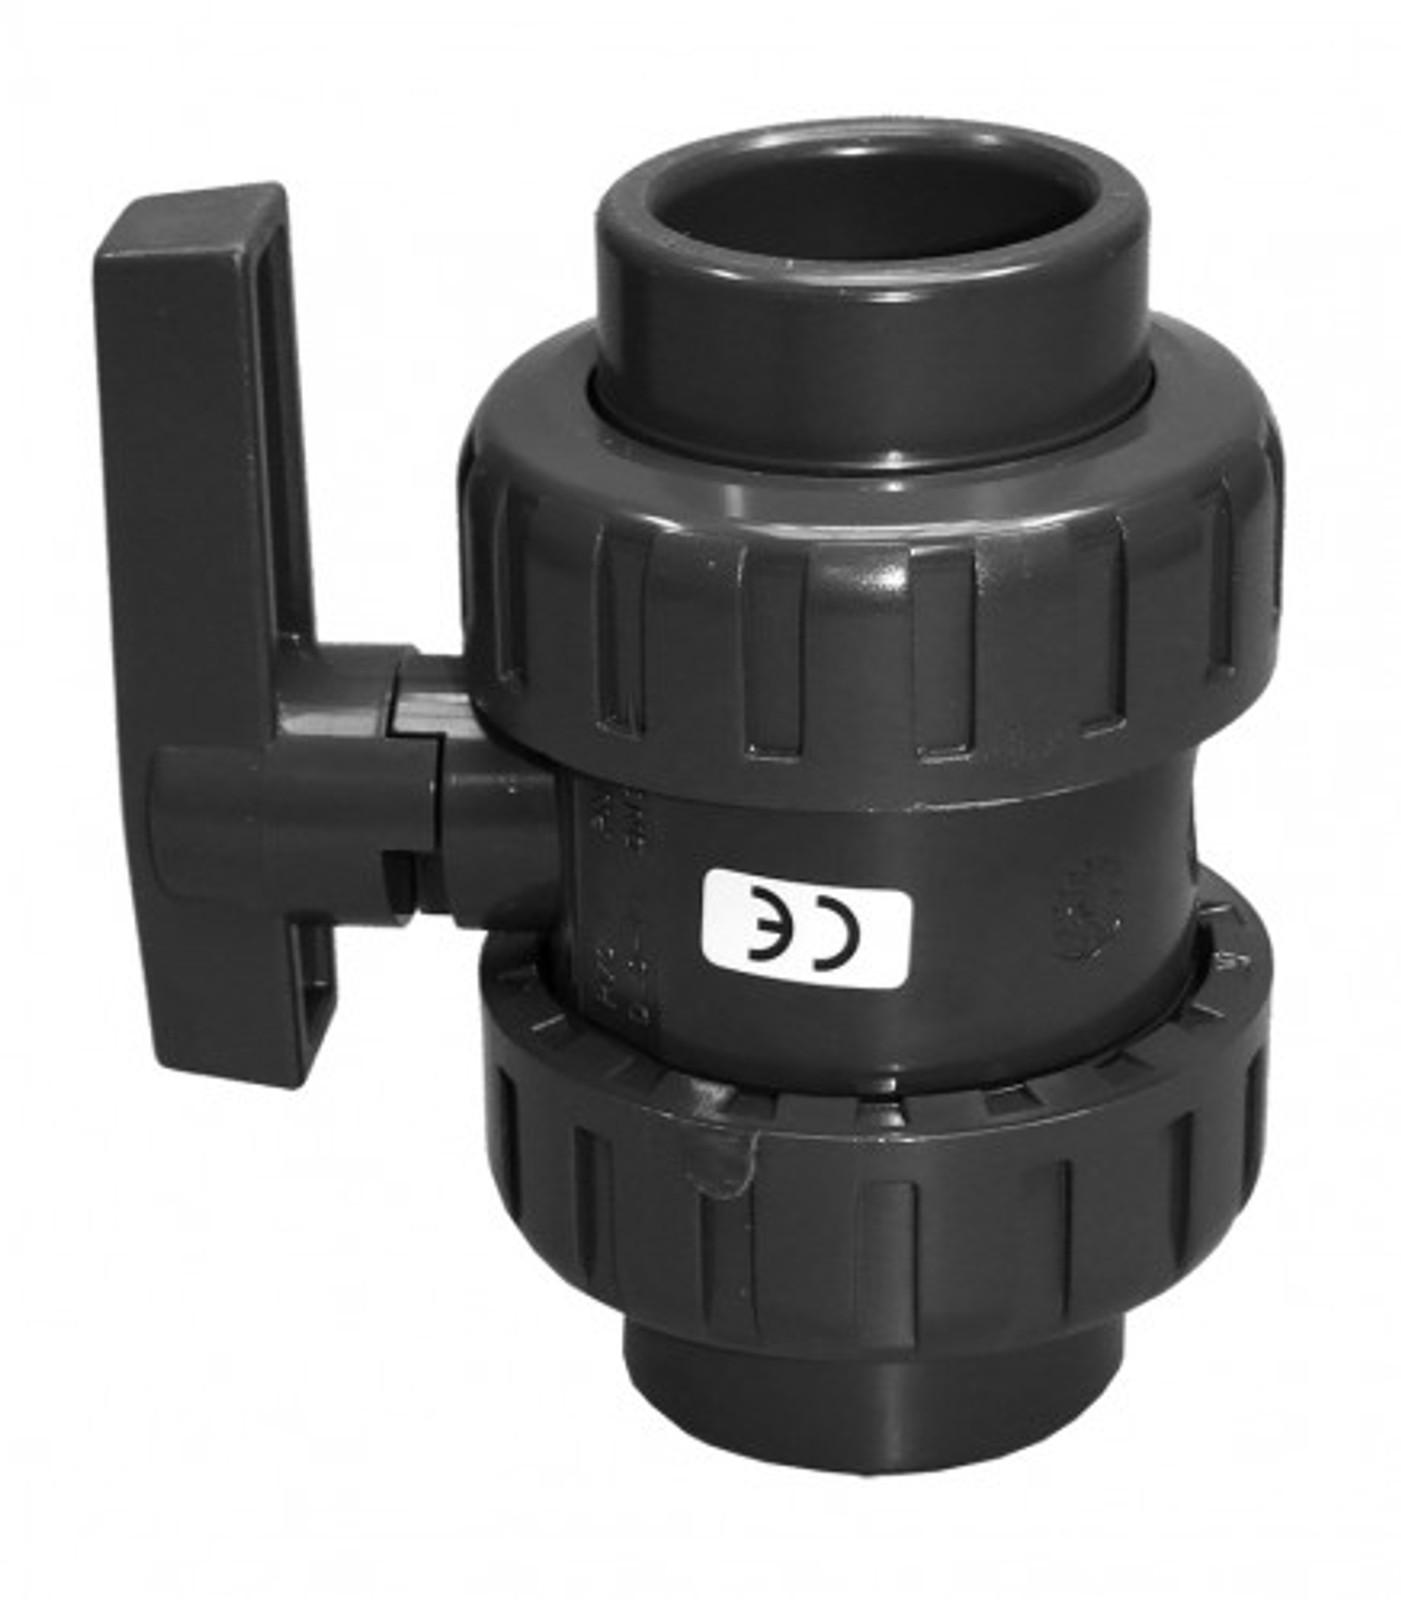 PVC-Kugelhahn m. 2 Anschlußenden, Ø 50 mm